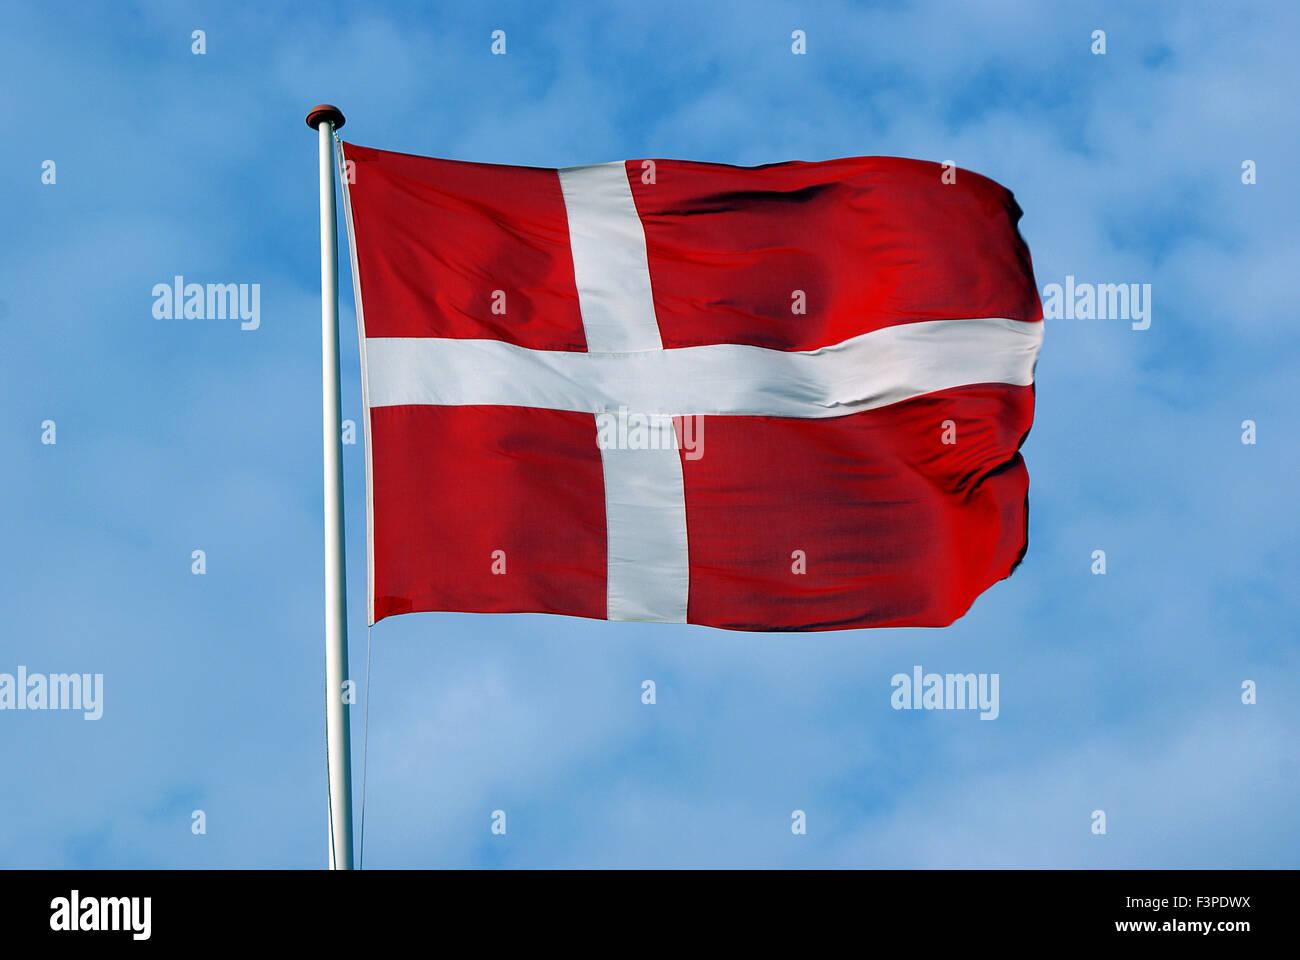 Dannebrog, The Danish Flag - Stock Image